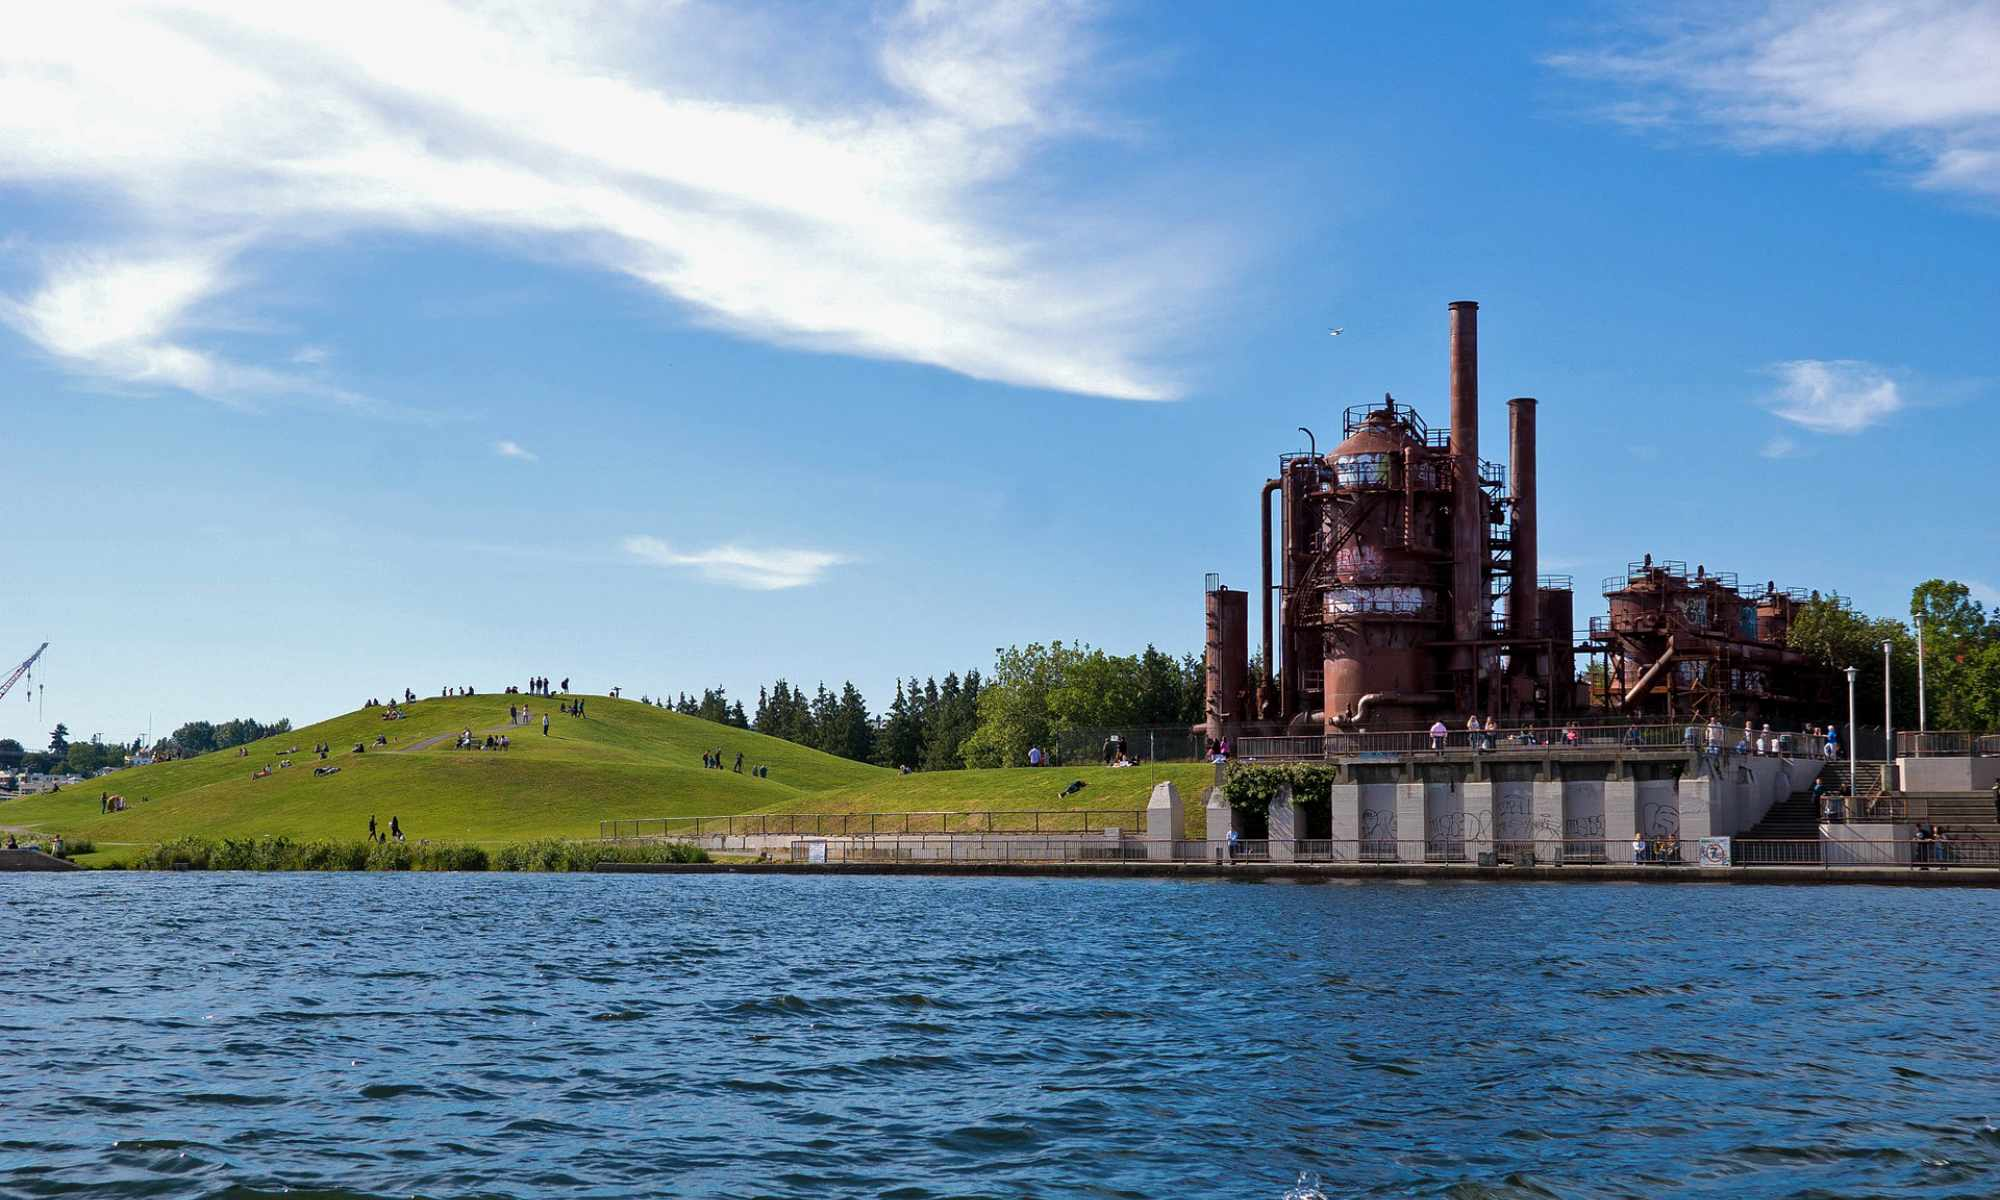 Gas Works Park in the Wallingford Neighborhood of Seattle